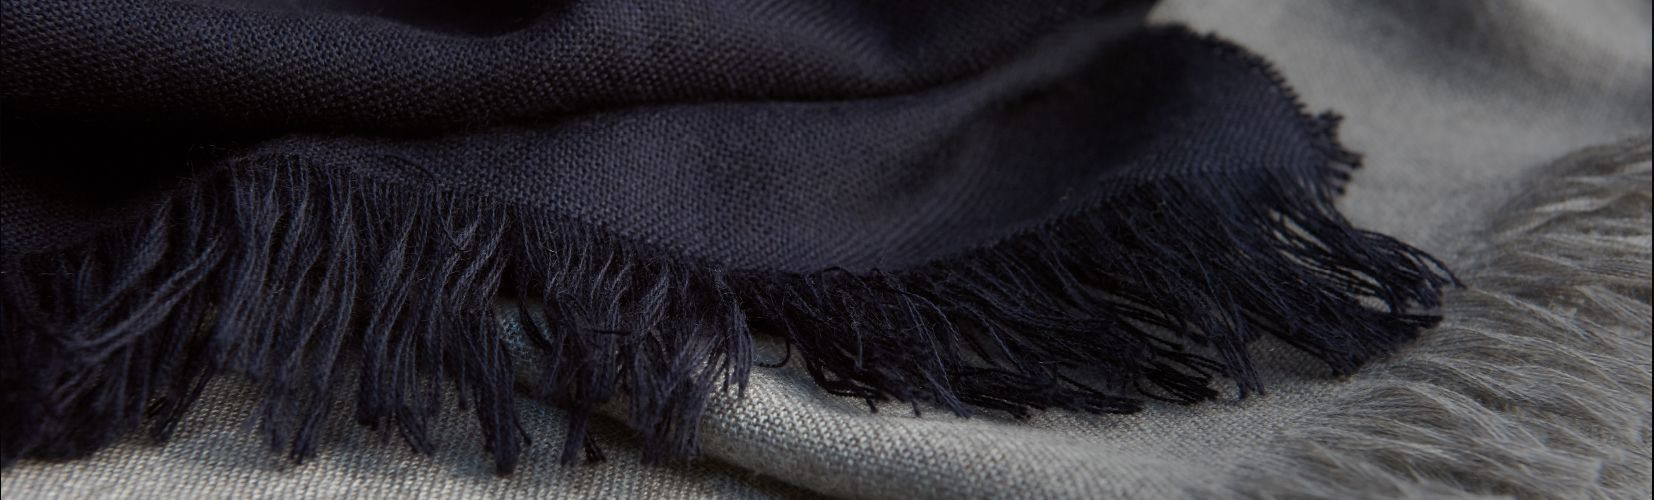 Huntsman Saville Row Accessories Shop Header Image - Navy and Grey Cashmere Scarves